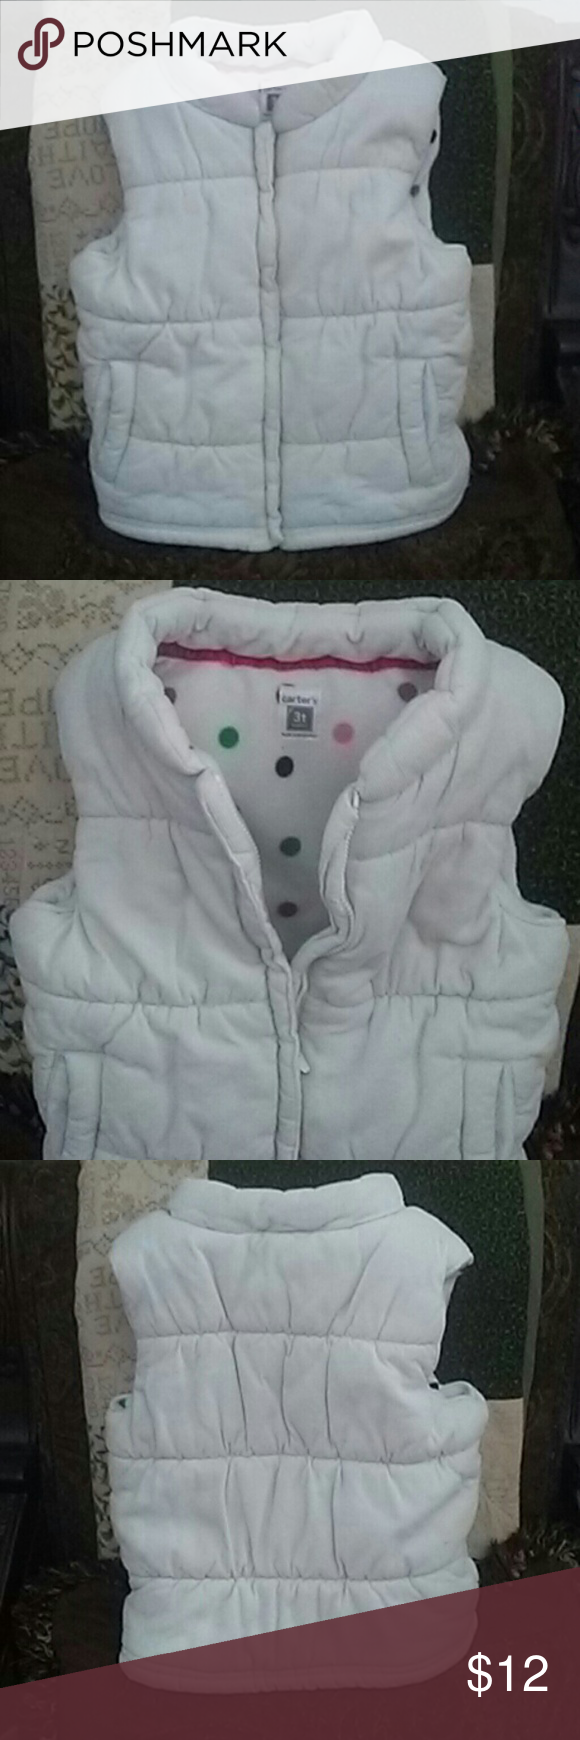 Carters white vest Toddler white carters vest Carter's Jackets & Coats Vests